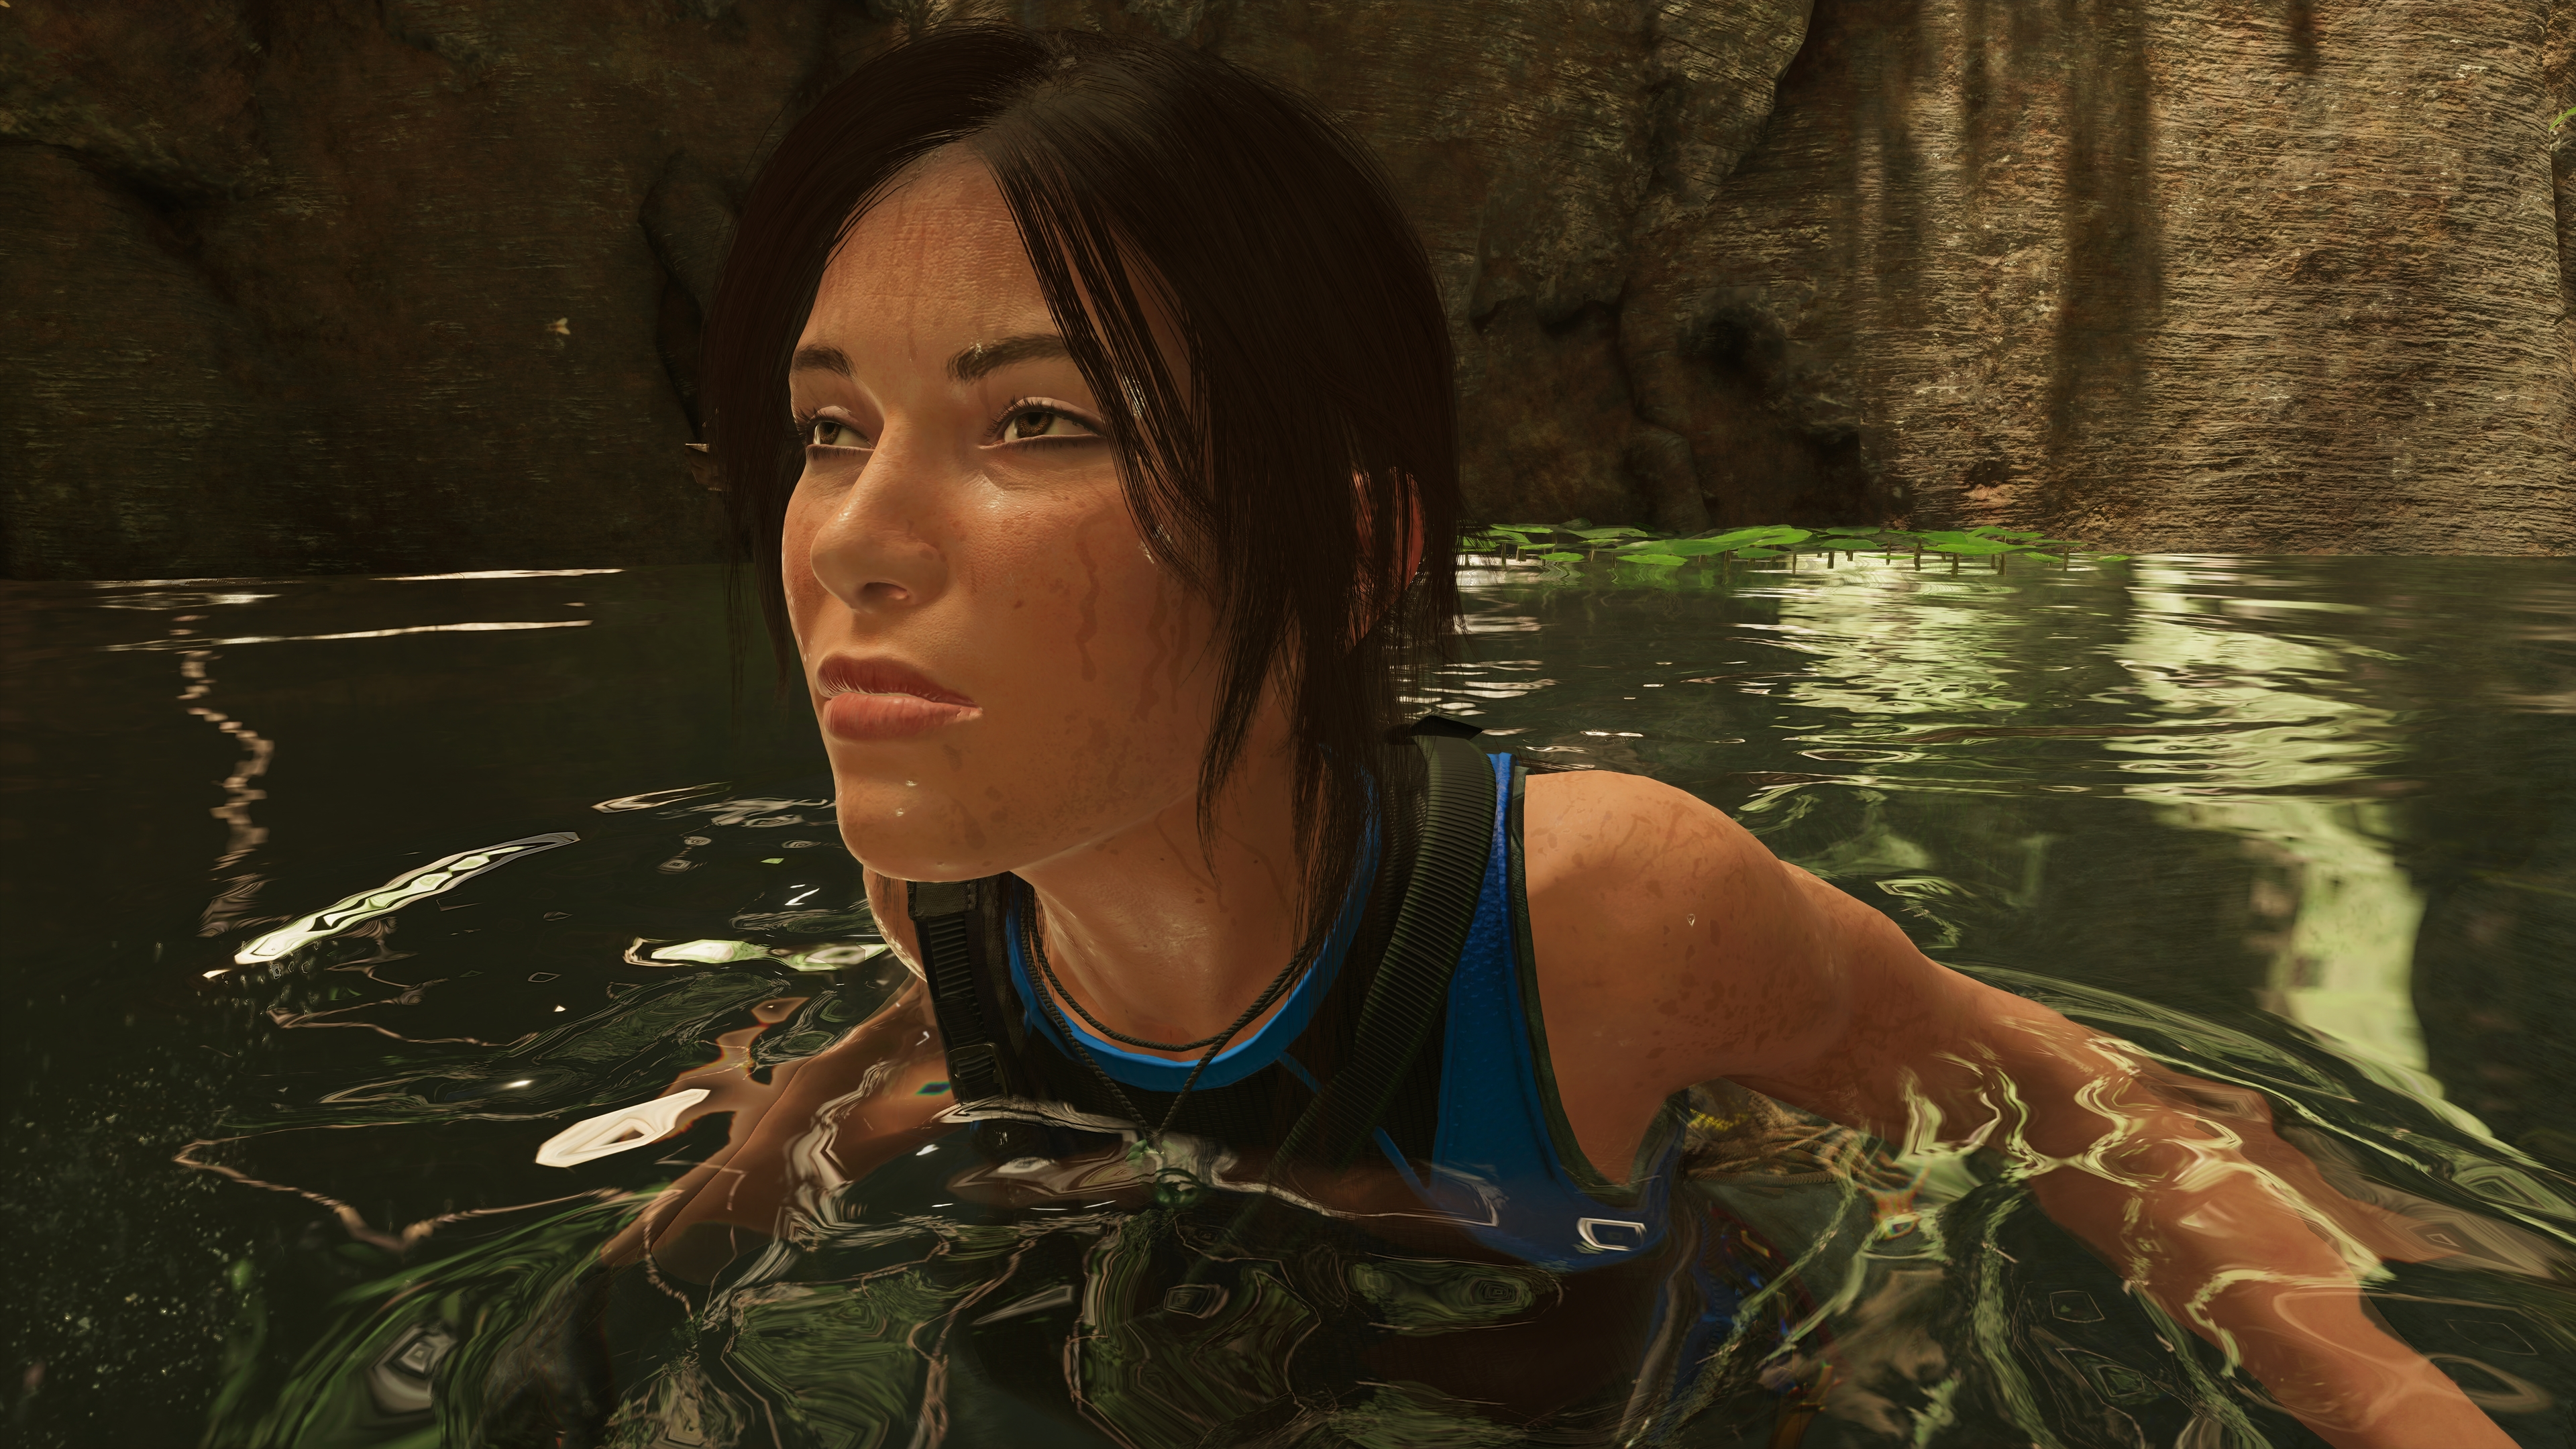 Shadow of the Tomb Raider скриншот 4k ultra graphics Nvidia GeForce RTX 2080 - Shadow of the Tomb Raider